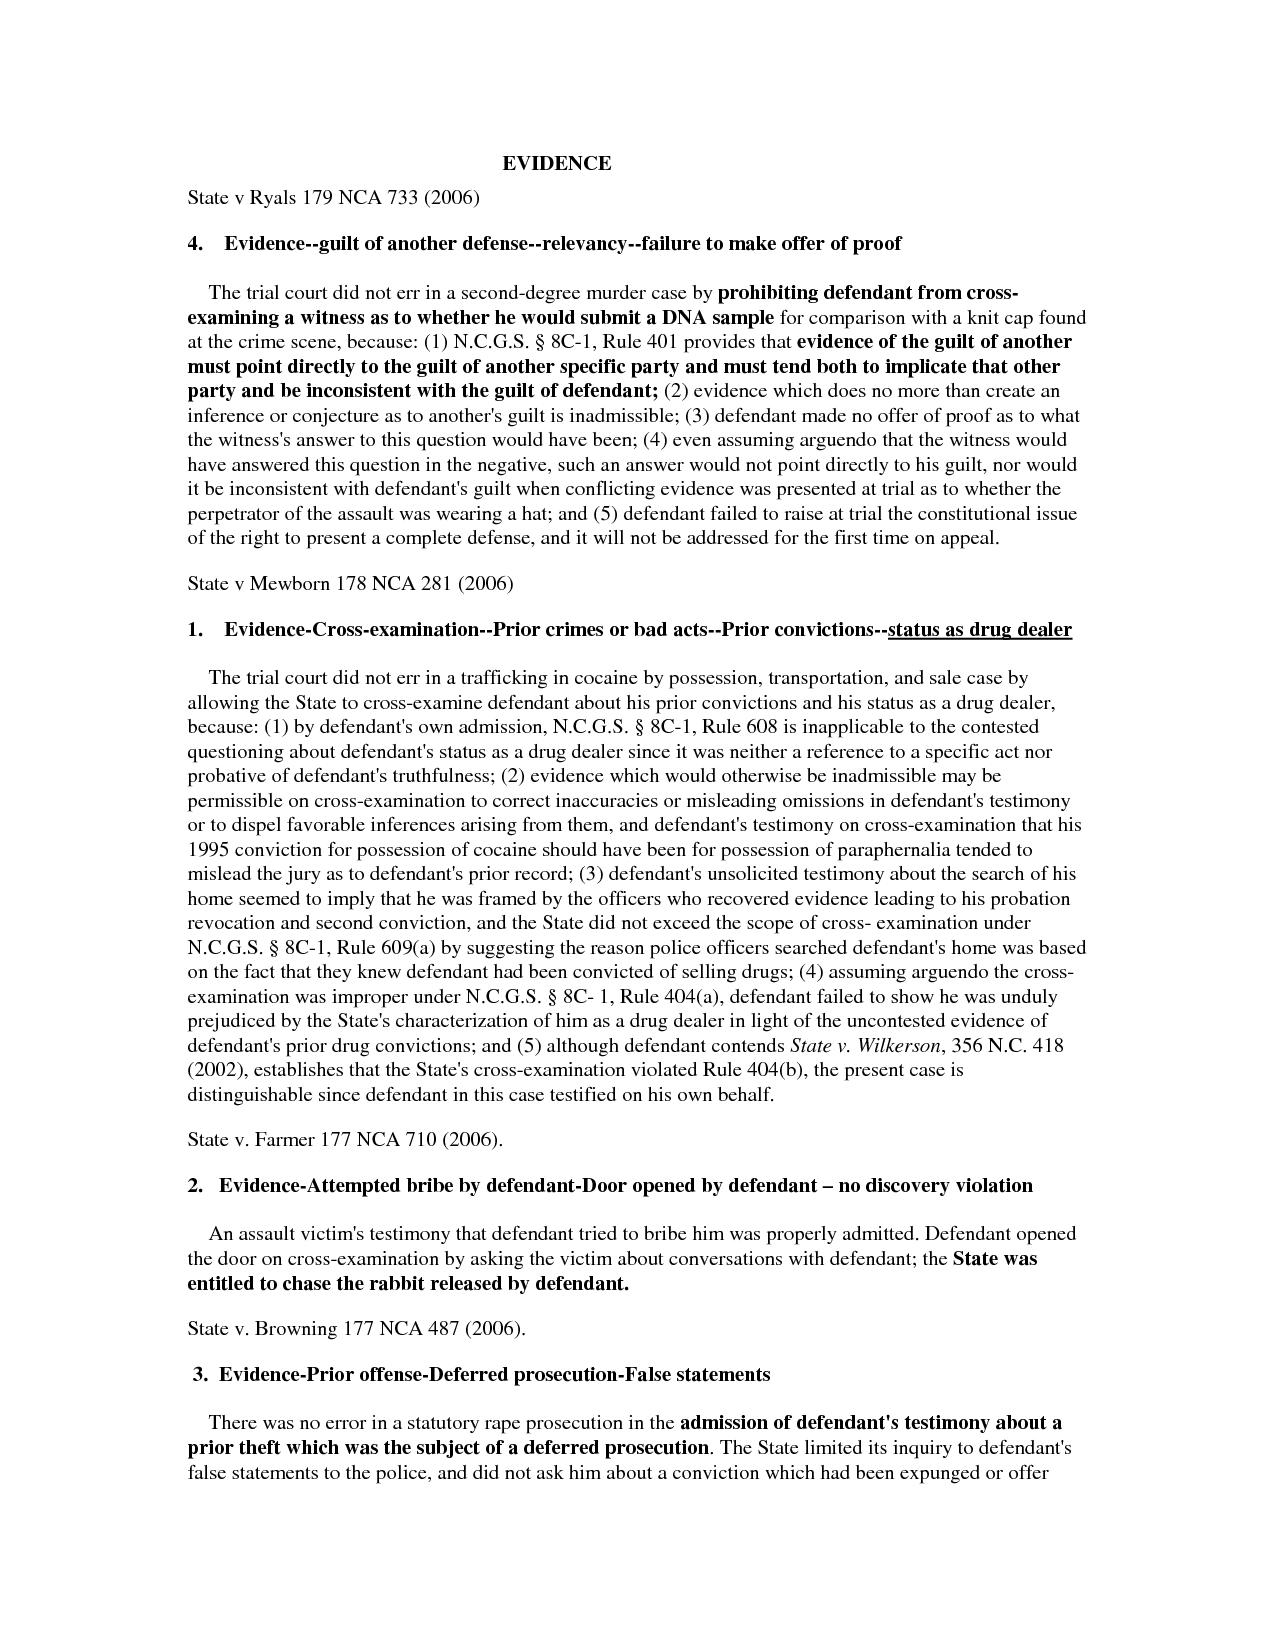 Dwi Sample Character Reference Letter Dresbilymas Soupcharacter